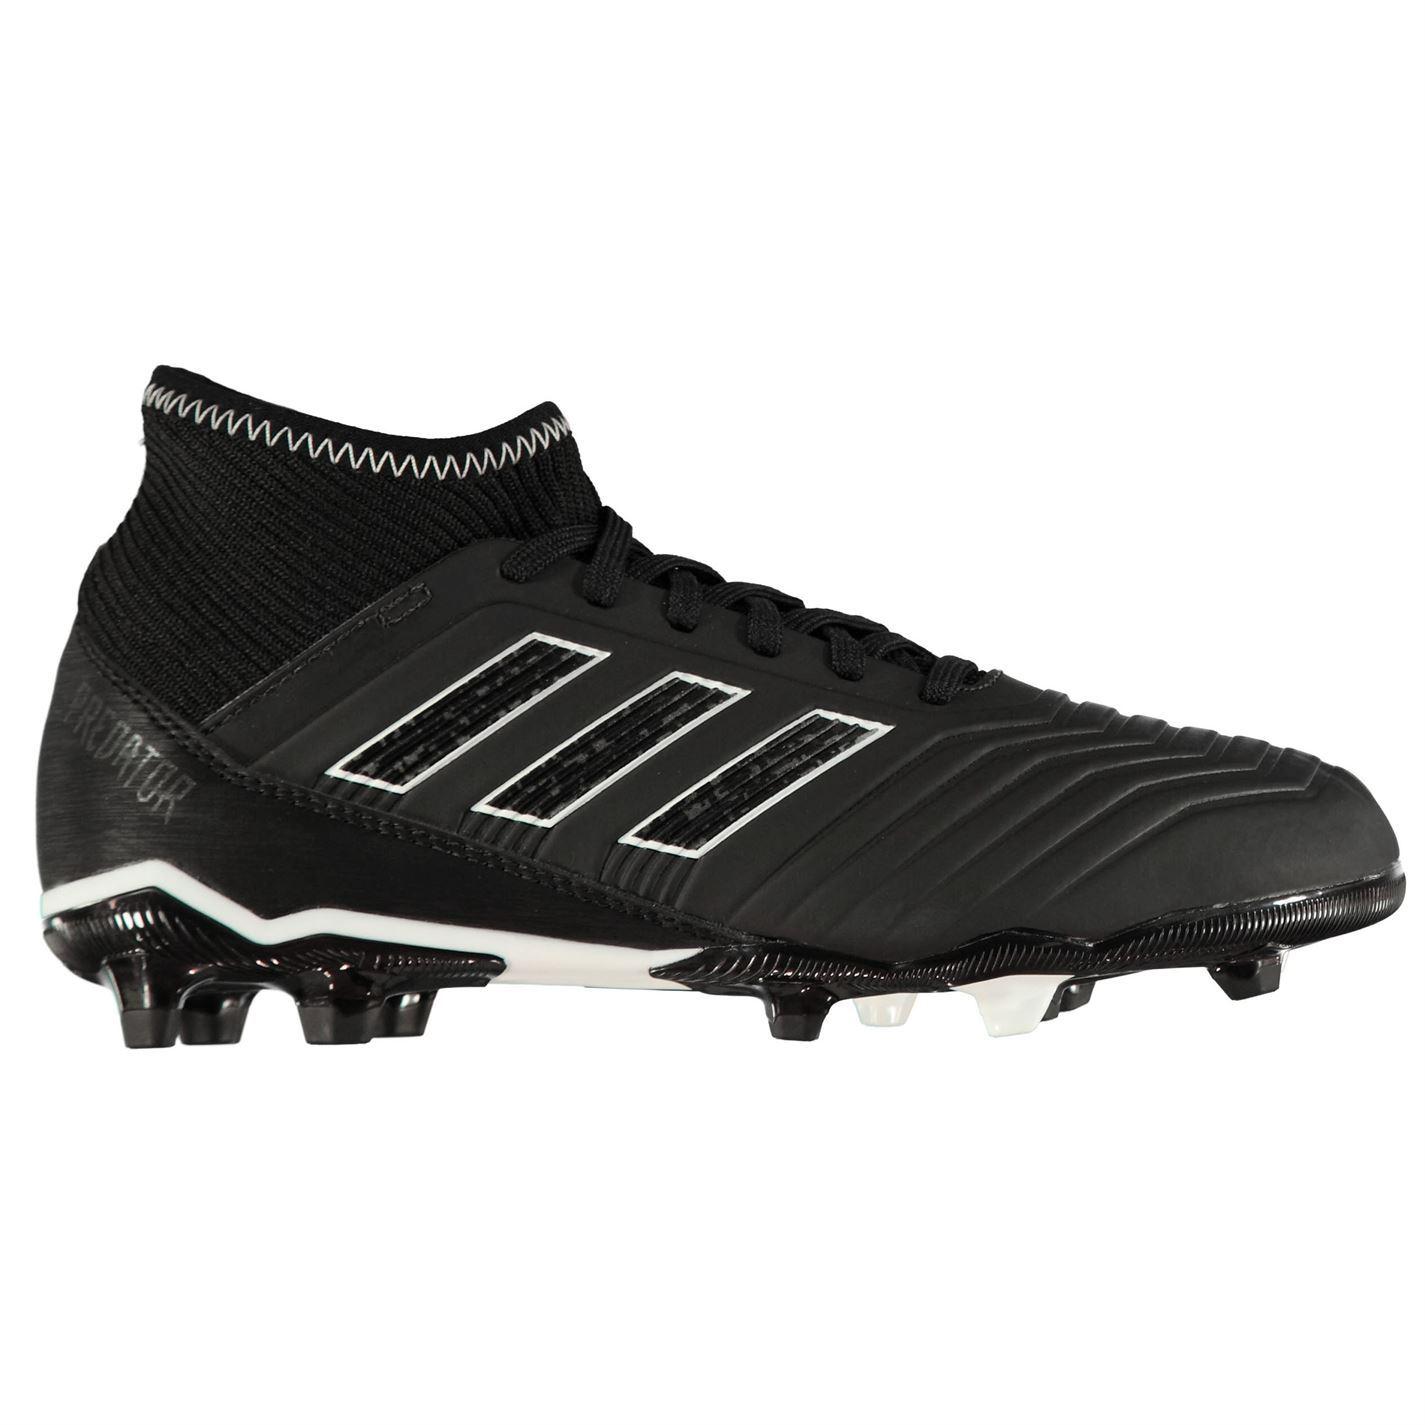 a538faa8 ... adidas Predator 18.3 Firm Ground FG Football Boots Childs Black Soccer  Cleats ...